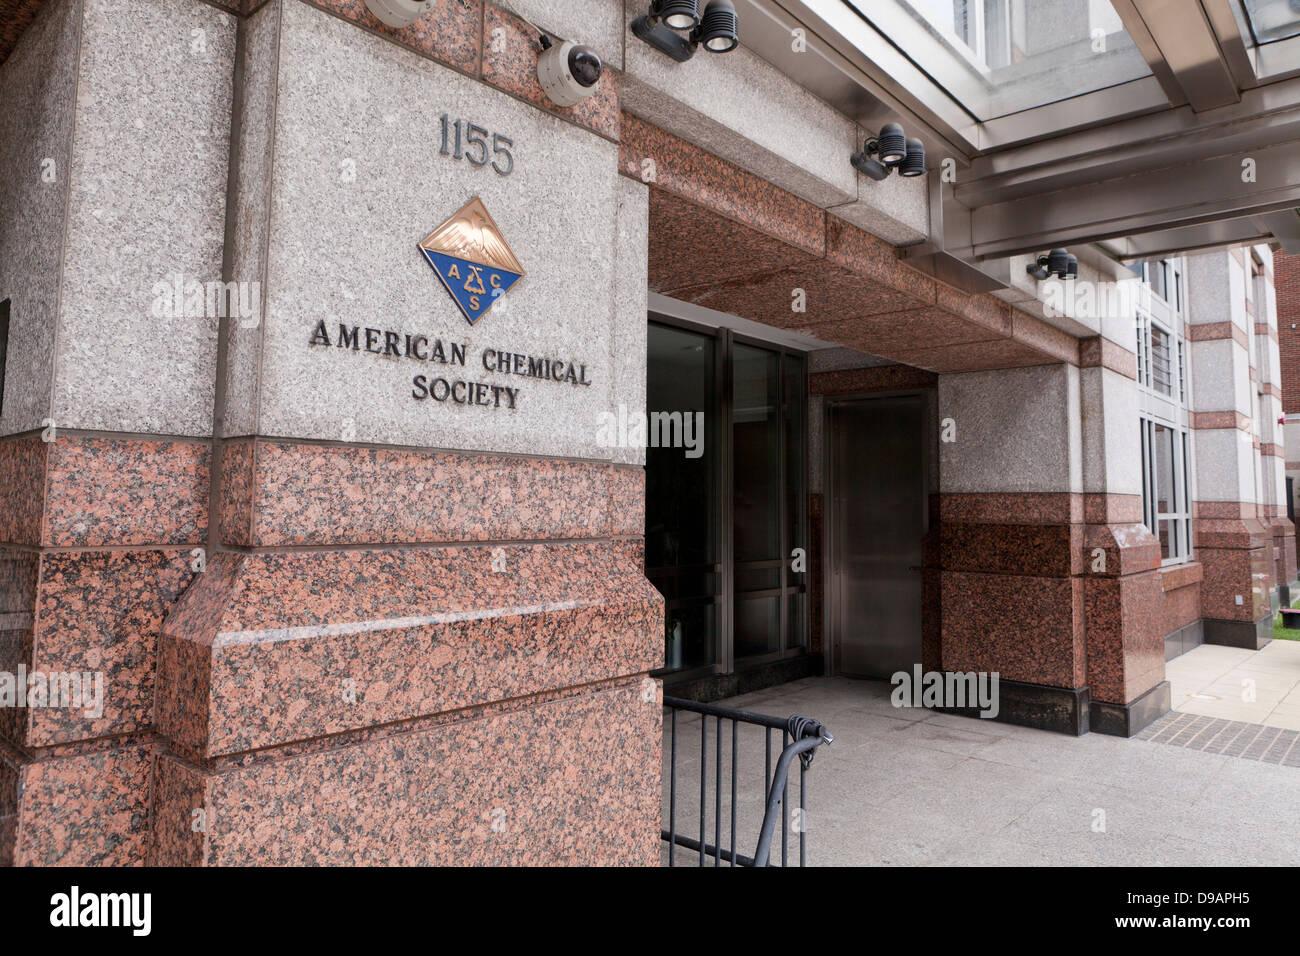 The American Chemical Society building  - Washington, DC USA - Stock Image